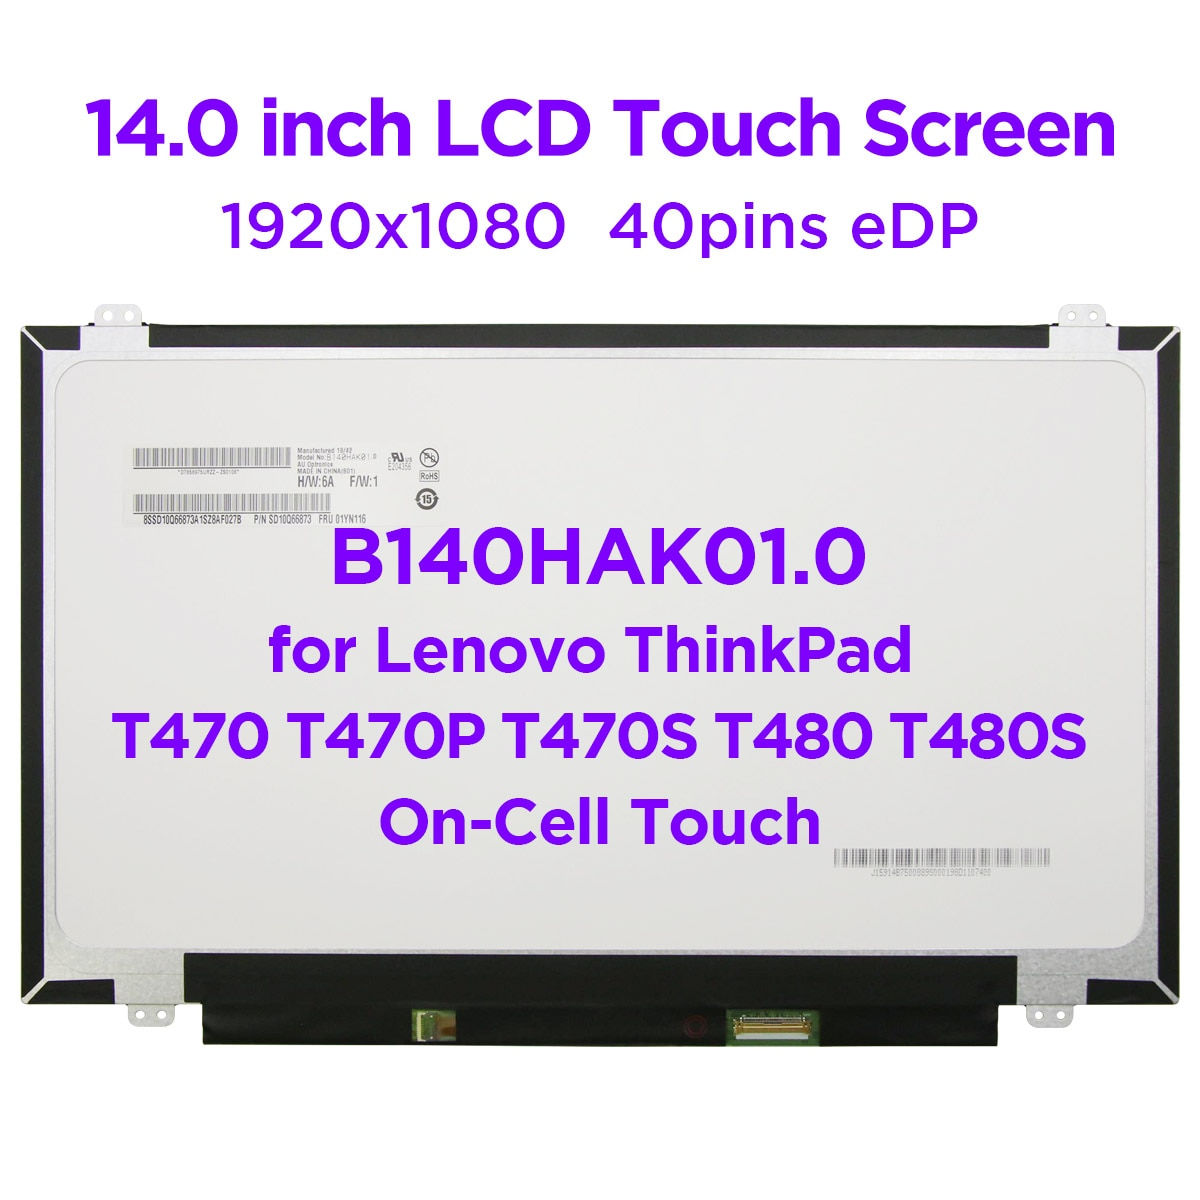 14.0 بوصة محمول LCD تعمل باللمس B140HAK01.0 صالح NV140FHM-T00 R140NWF5 R1 R6 لينوفو ثينك باد T470P T470S T470 T480 T480S